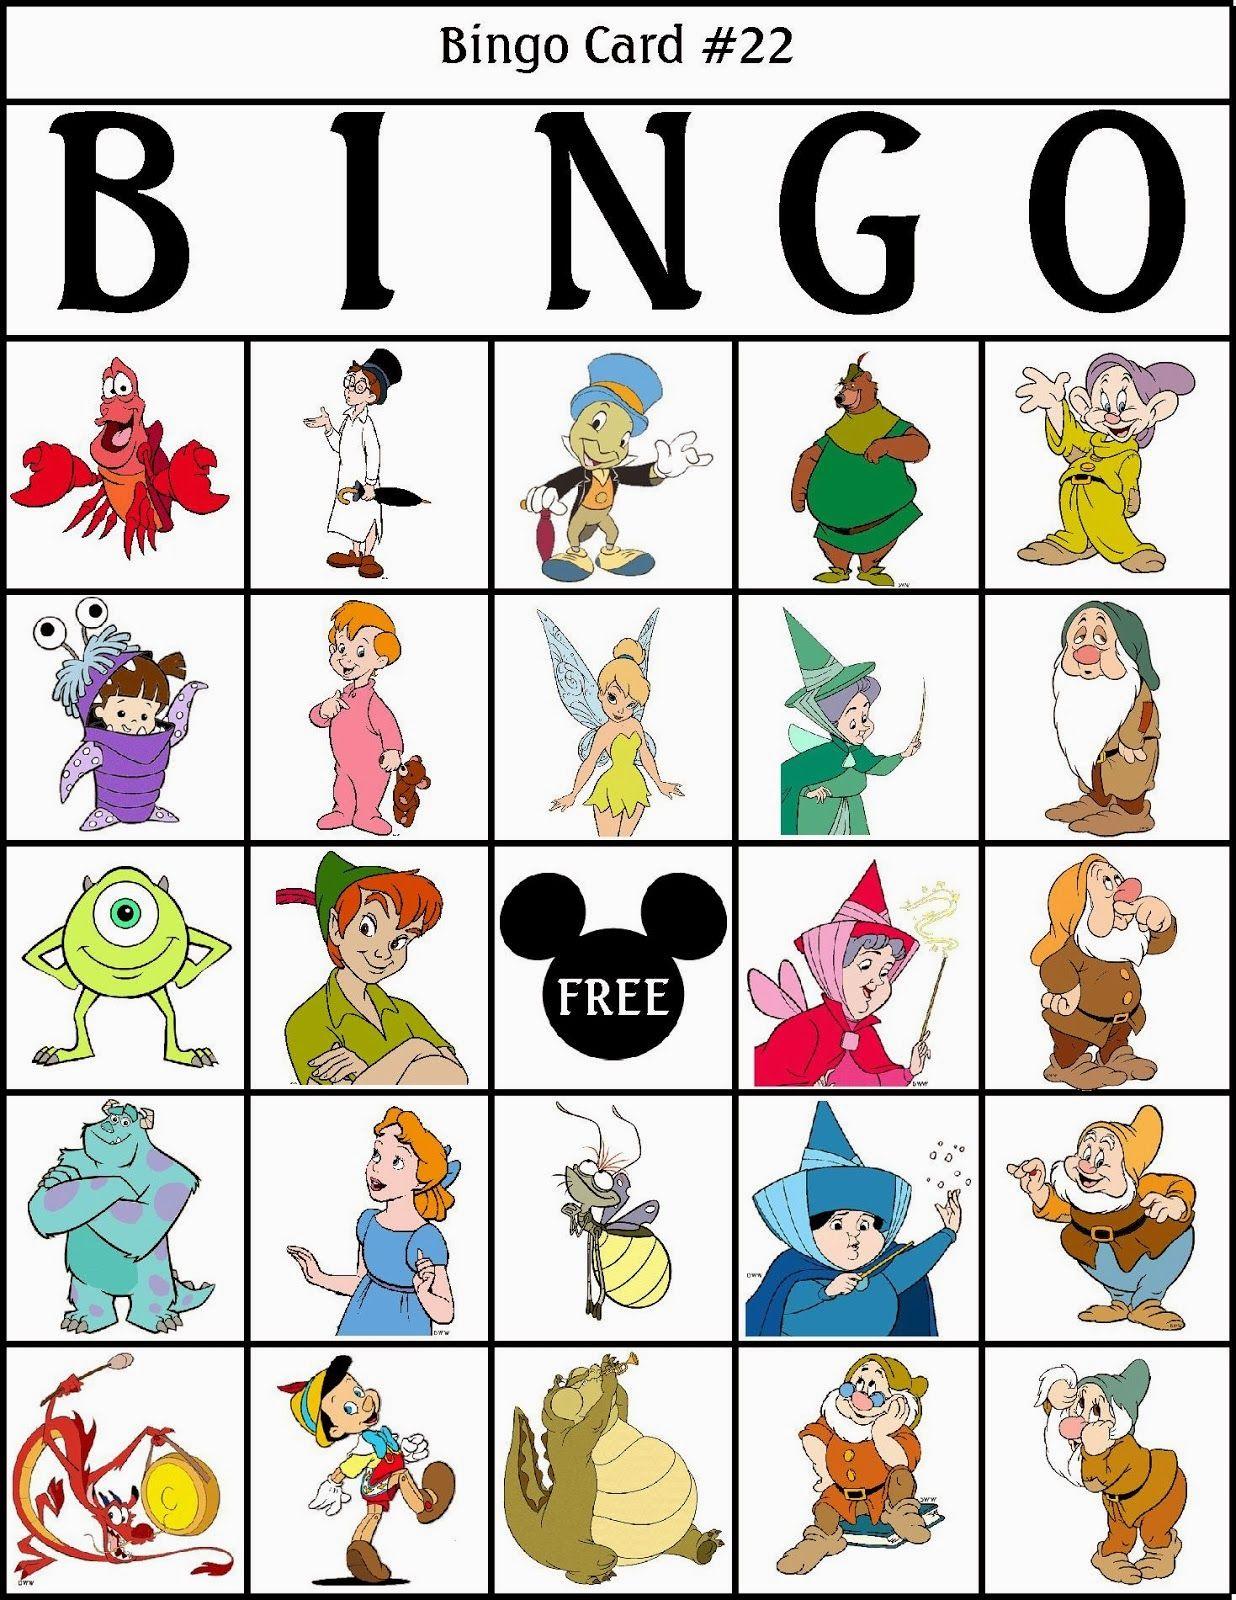 Bingo De Personajes Disney Para Imprimir Gratis Actividades De Disney Personajes Disney Bingo Para Imprimir